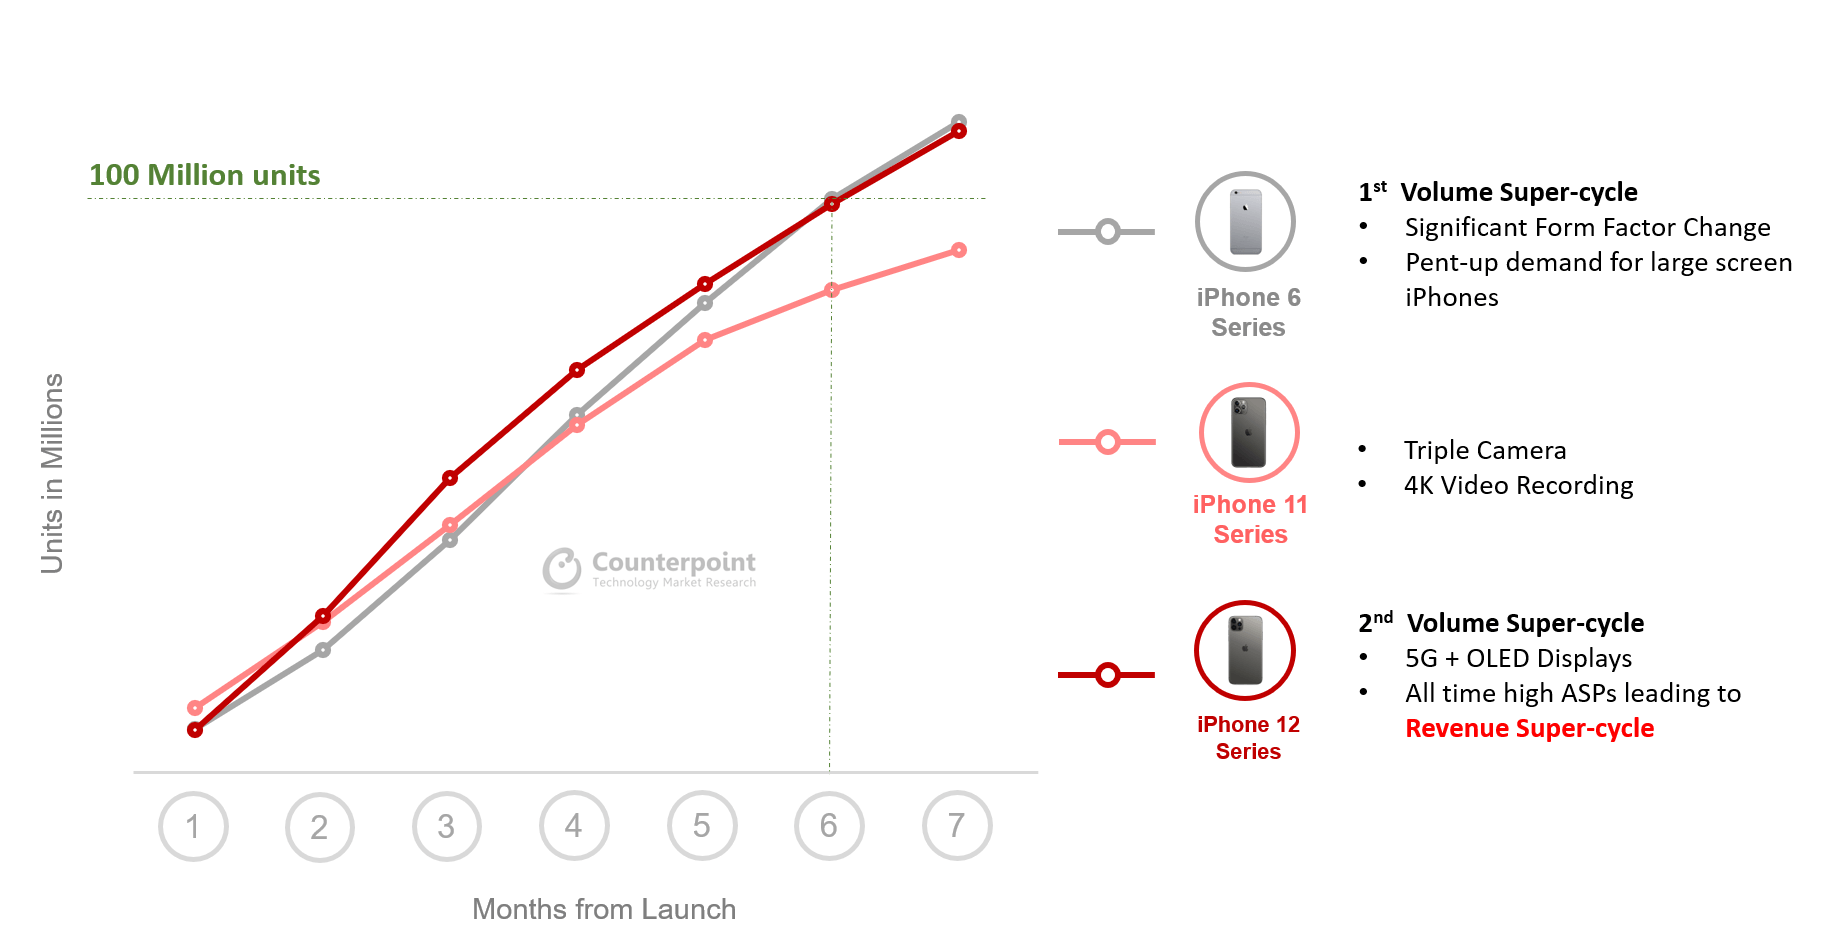 iPhone-Verkäufe April 2021 - Infografik - Counterpoint Research